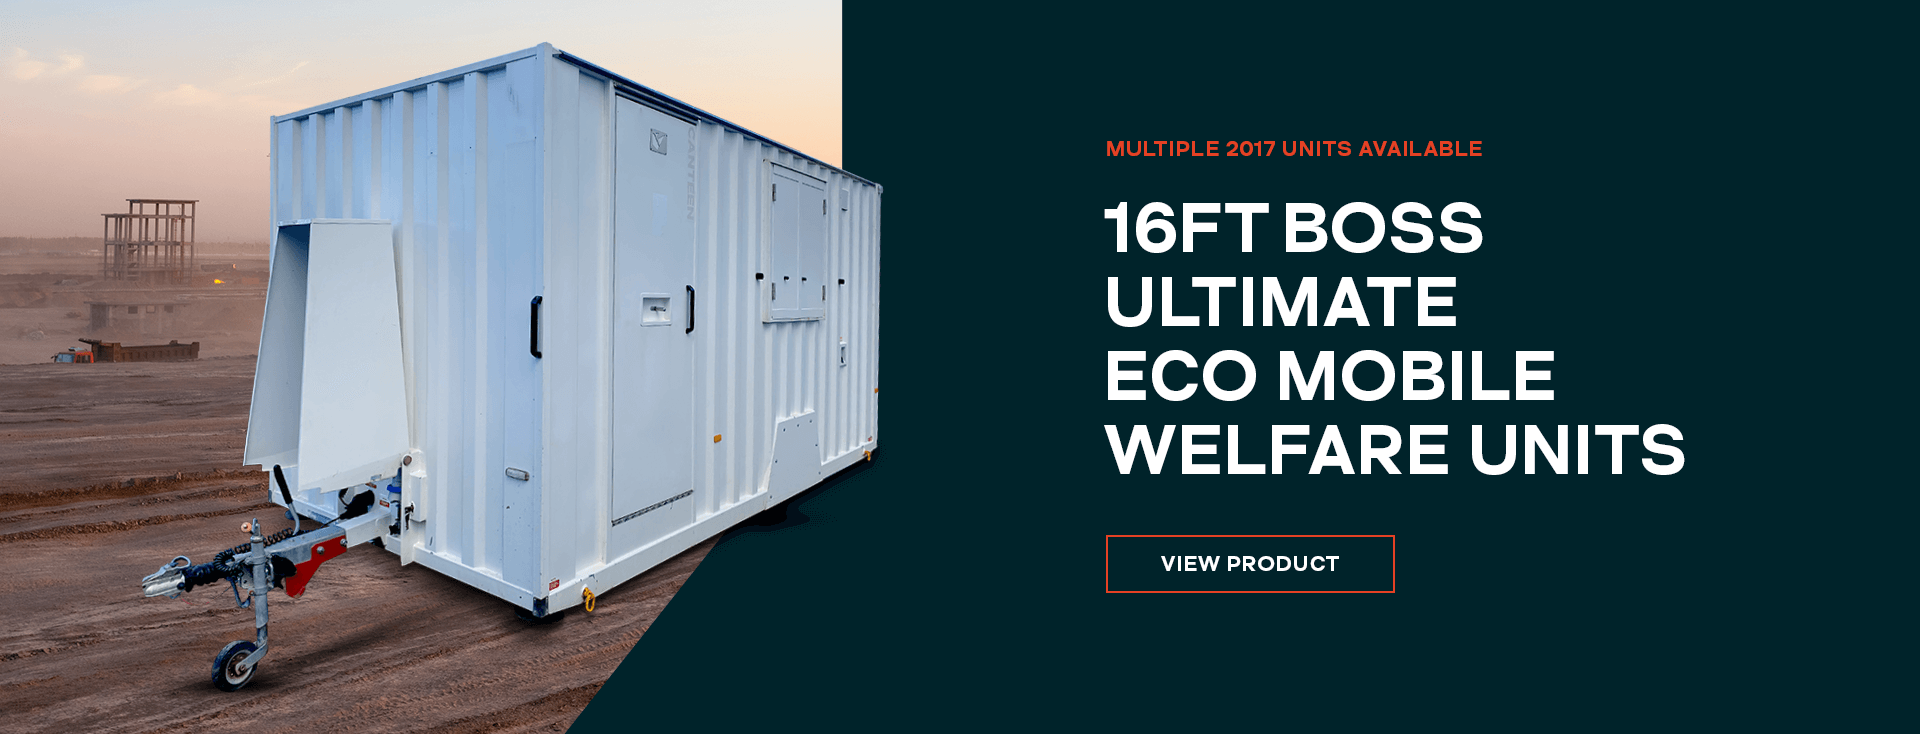 16ft Boss Ultimate Eco Mobile Welfare Units